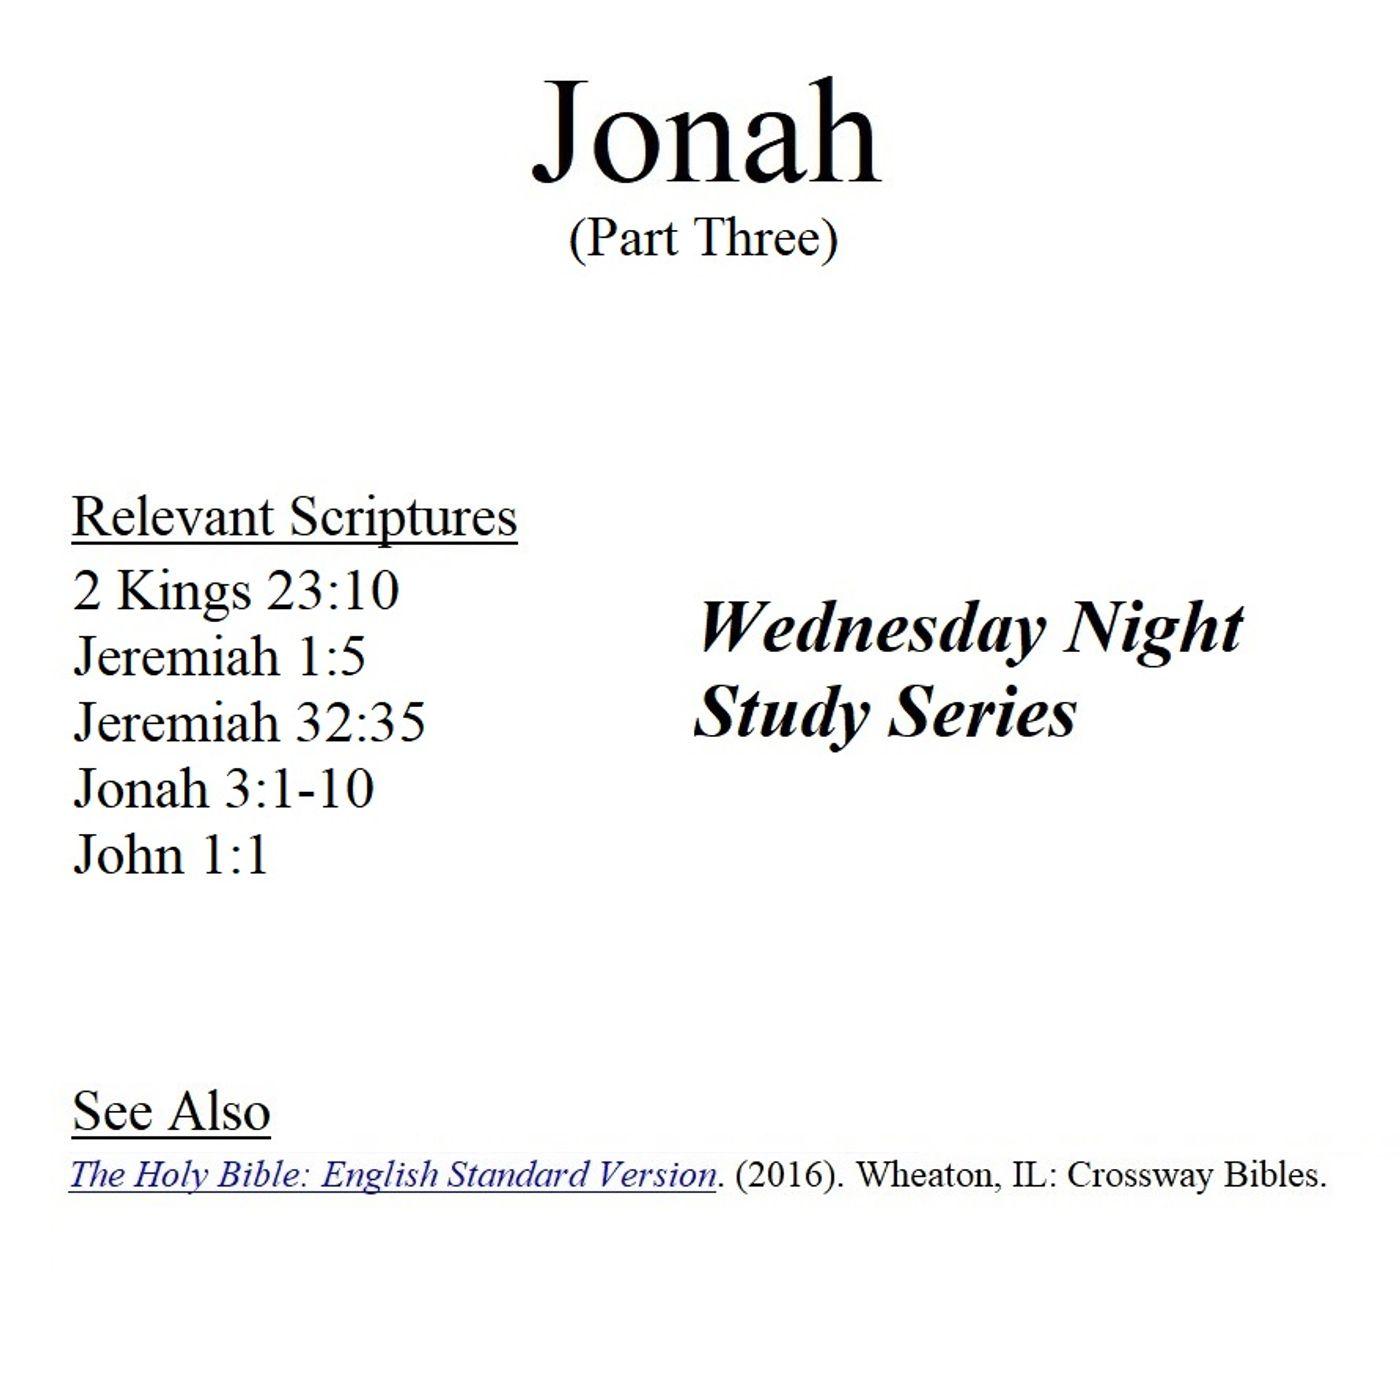 Wednesday Night Study Series - Jonah Part 3 - Repentance, Trinity, Abortion, Universalism